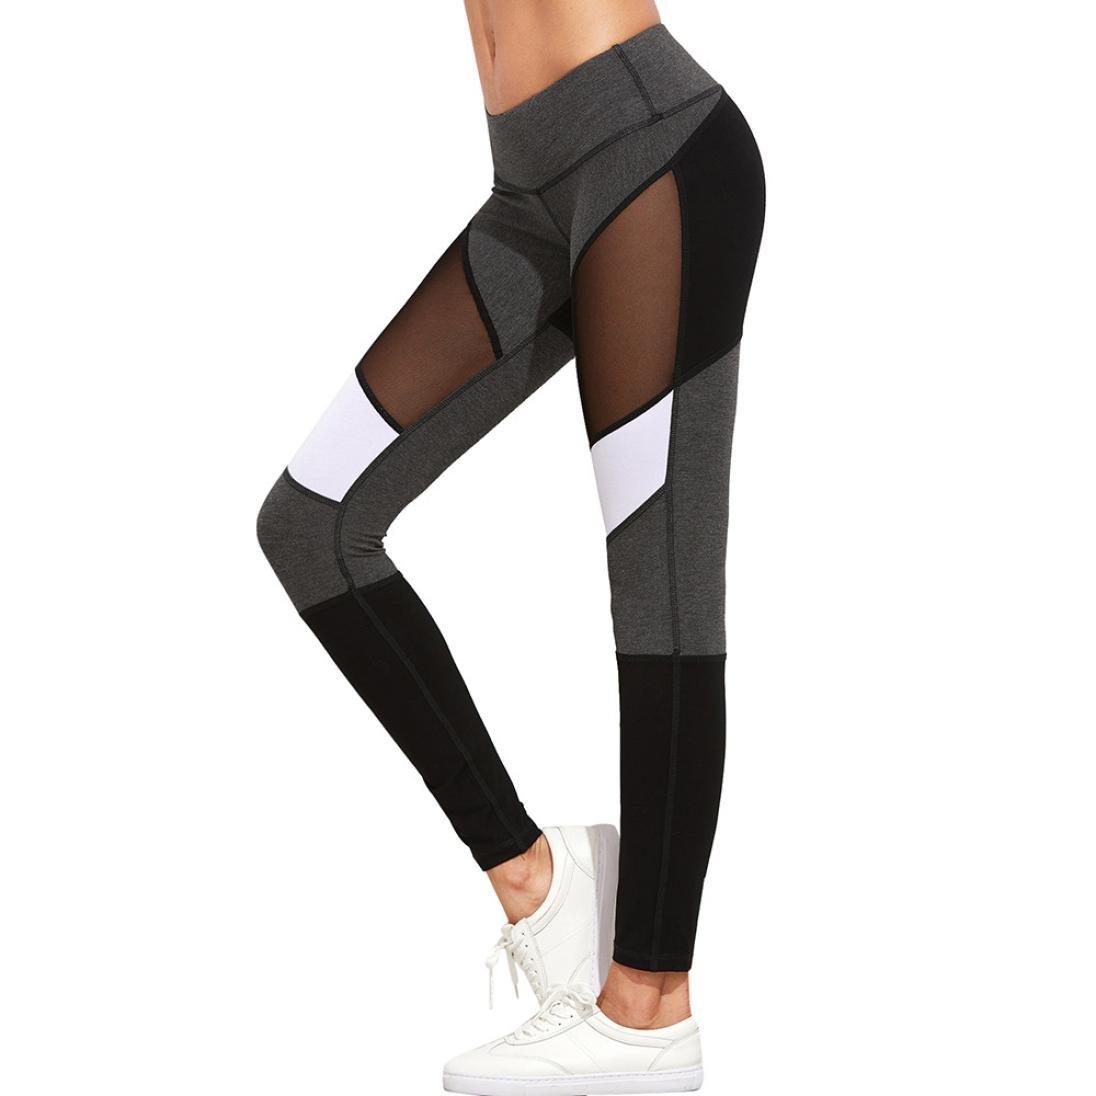 Tootu Women Fitness Pants Running Sport Yoga Leggings Pants Stretch Trousers JK-88532